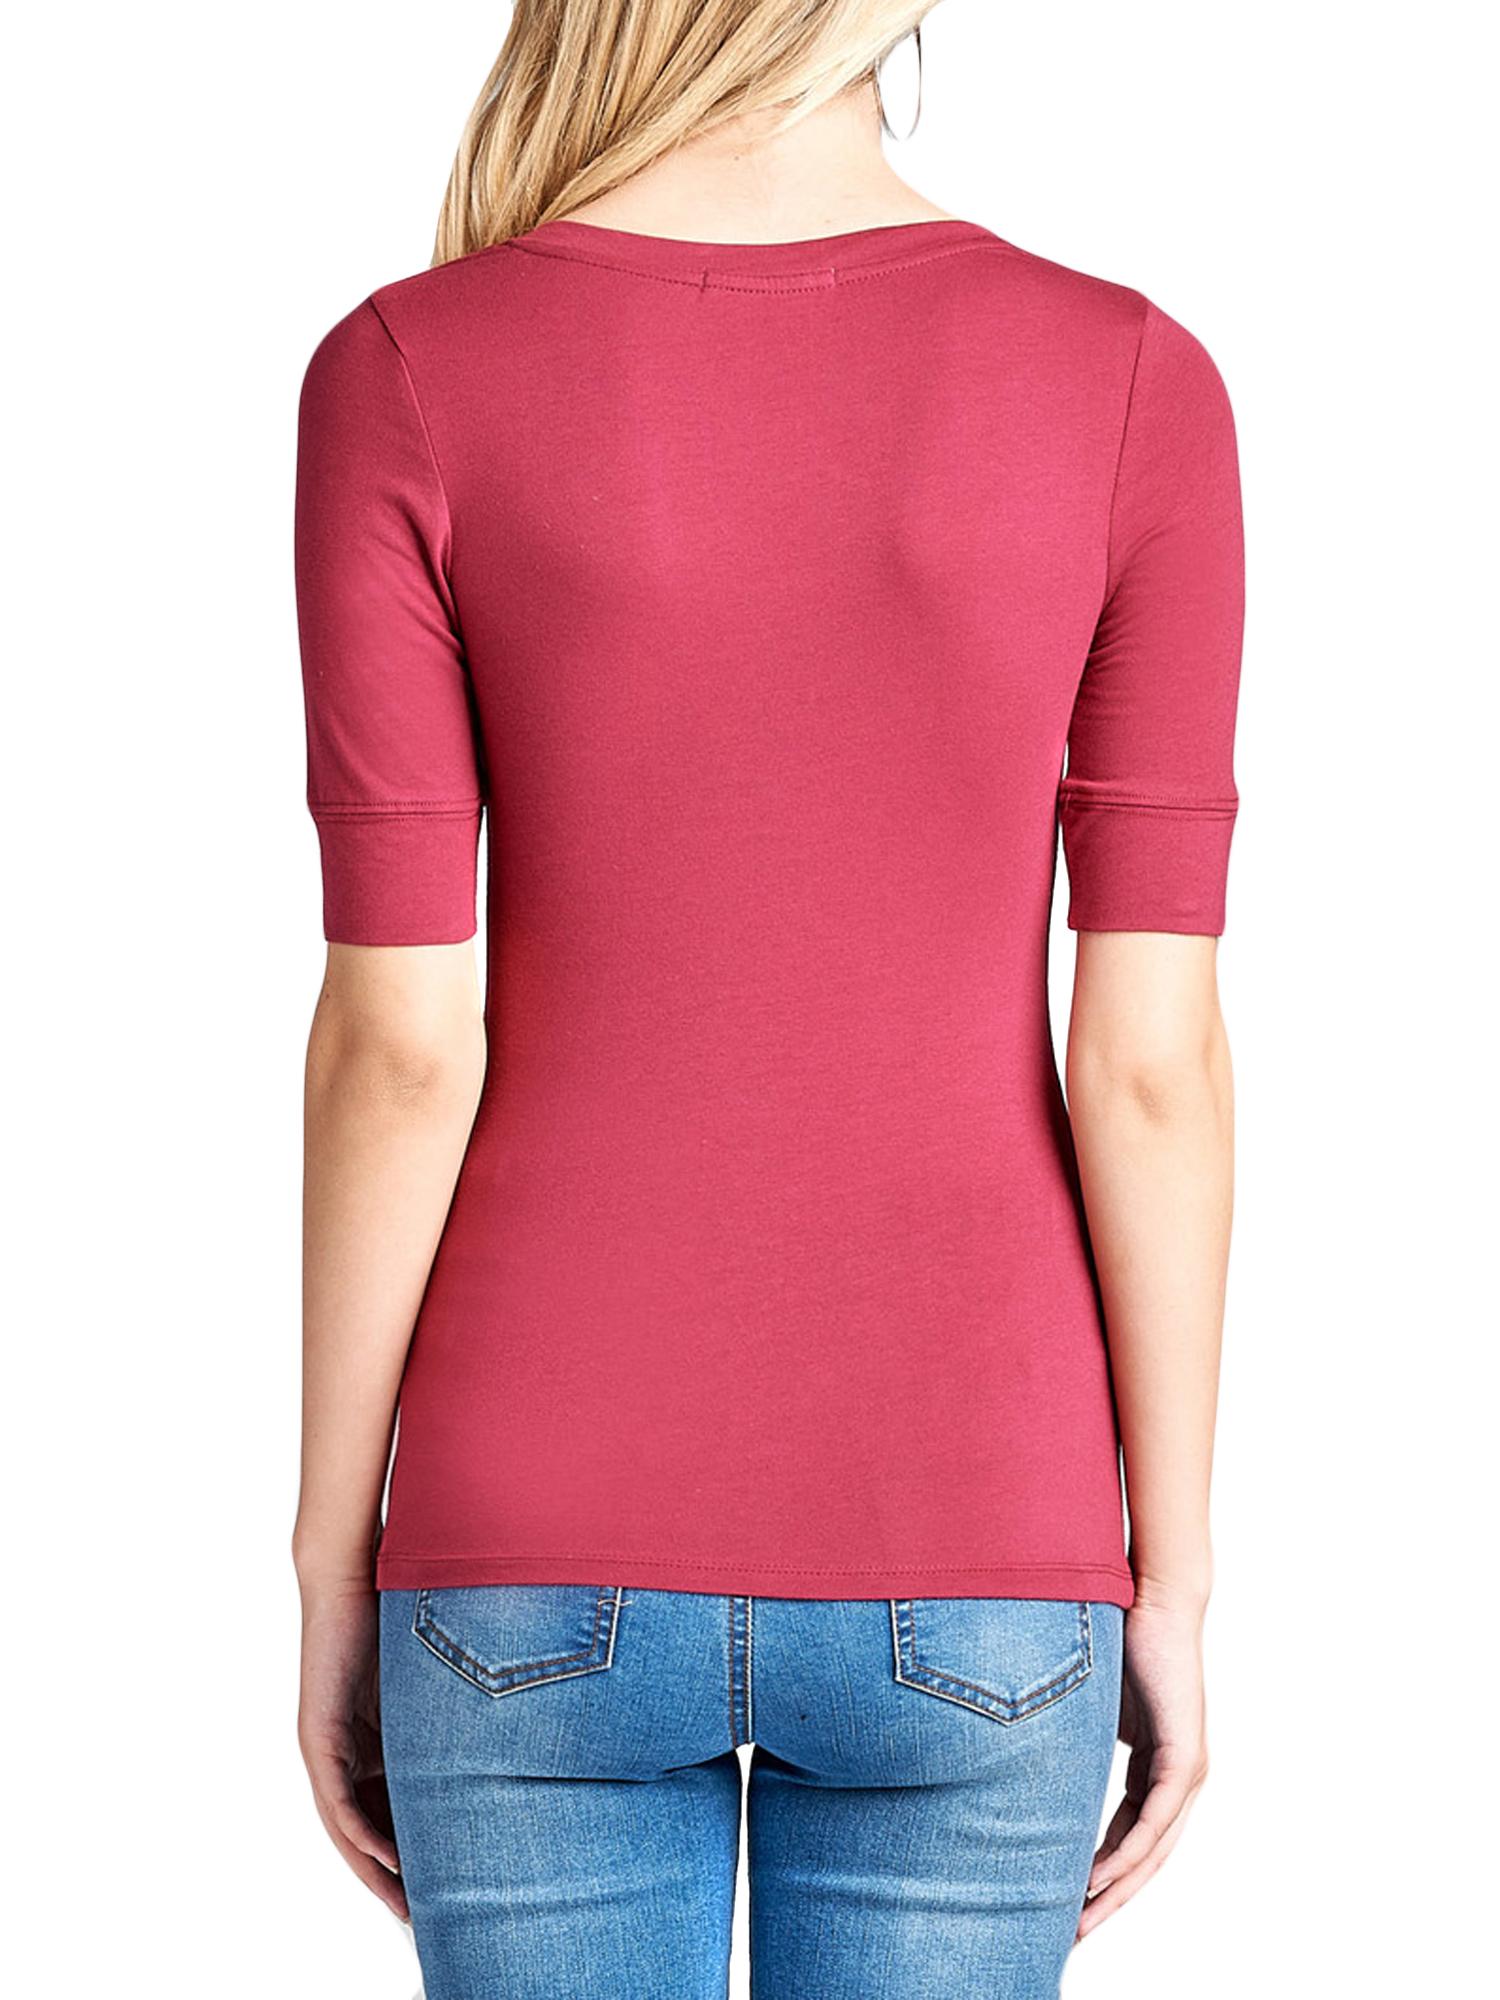 a22006979 Junior   Junior Plus Casual Basic Cotton V Neck Elbow Sleeve T-Shirt ...